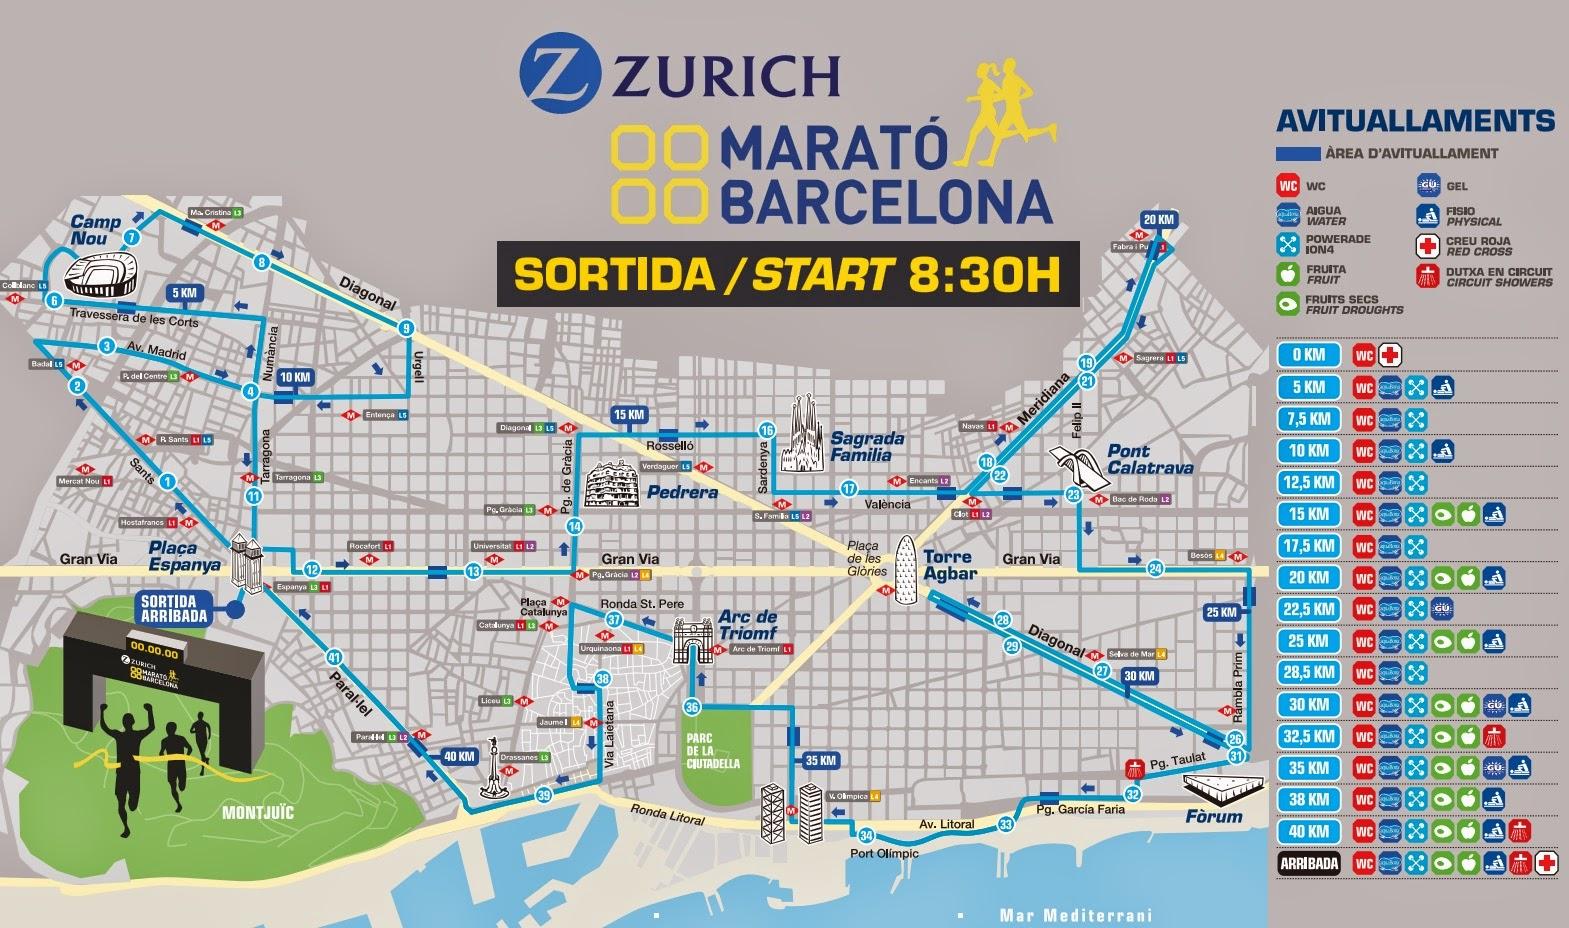 recorrido zurich marato de barcelona 2015